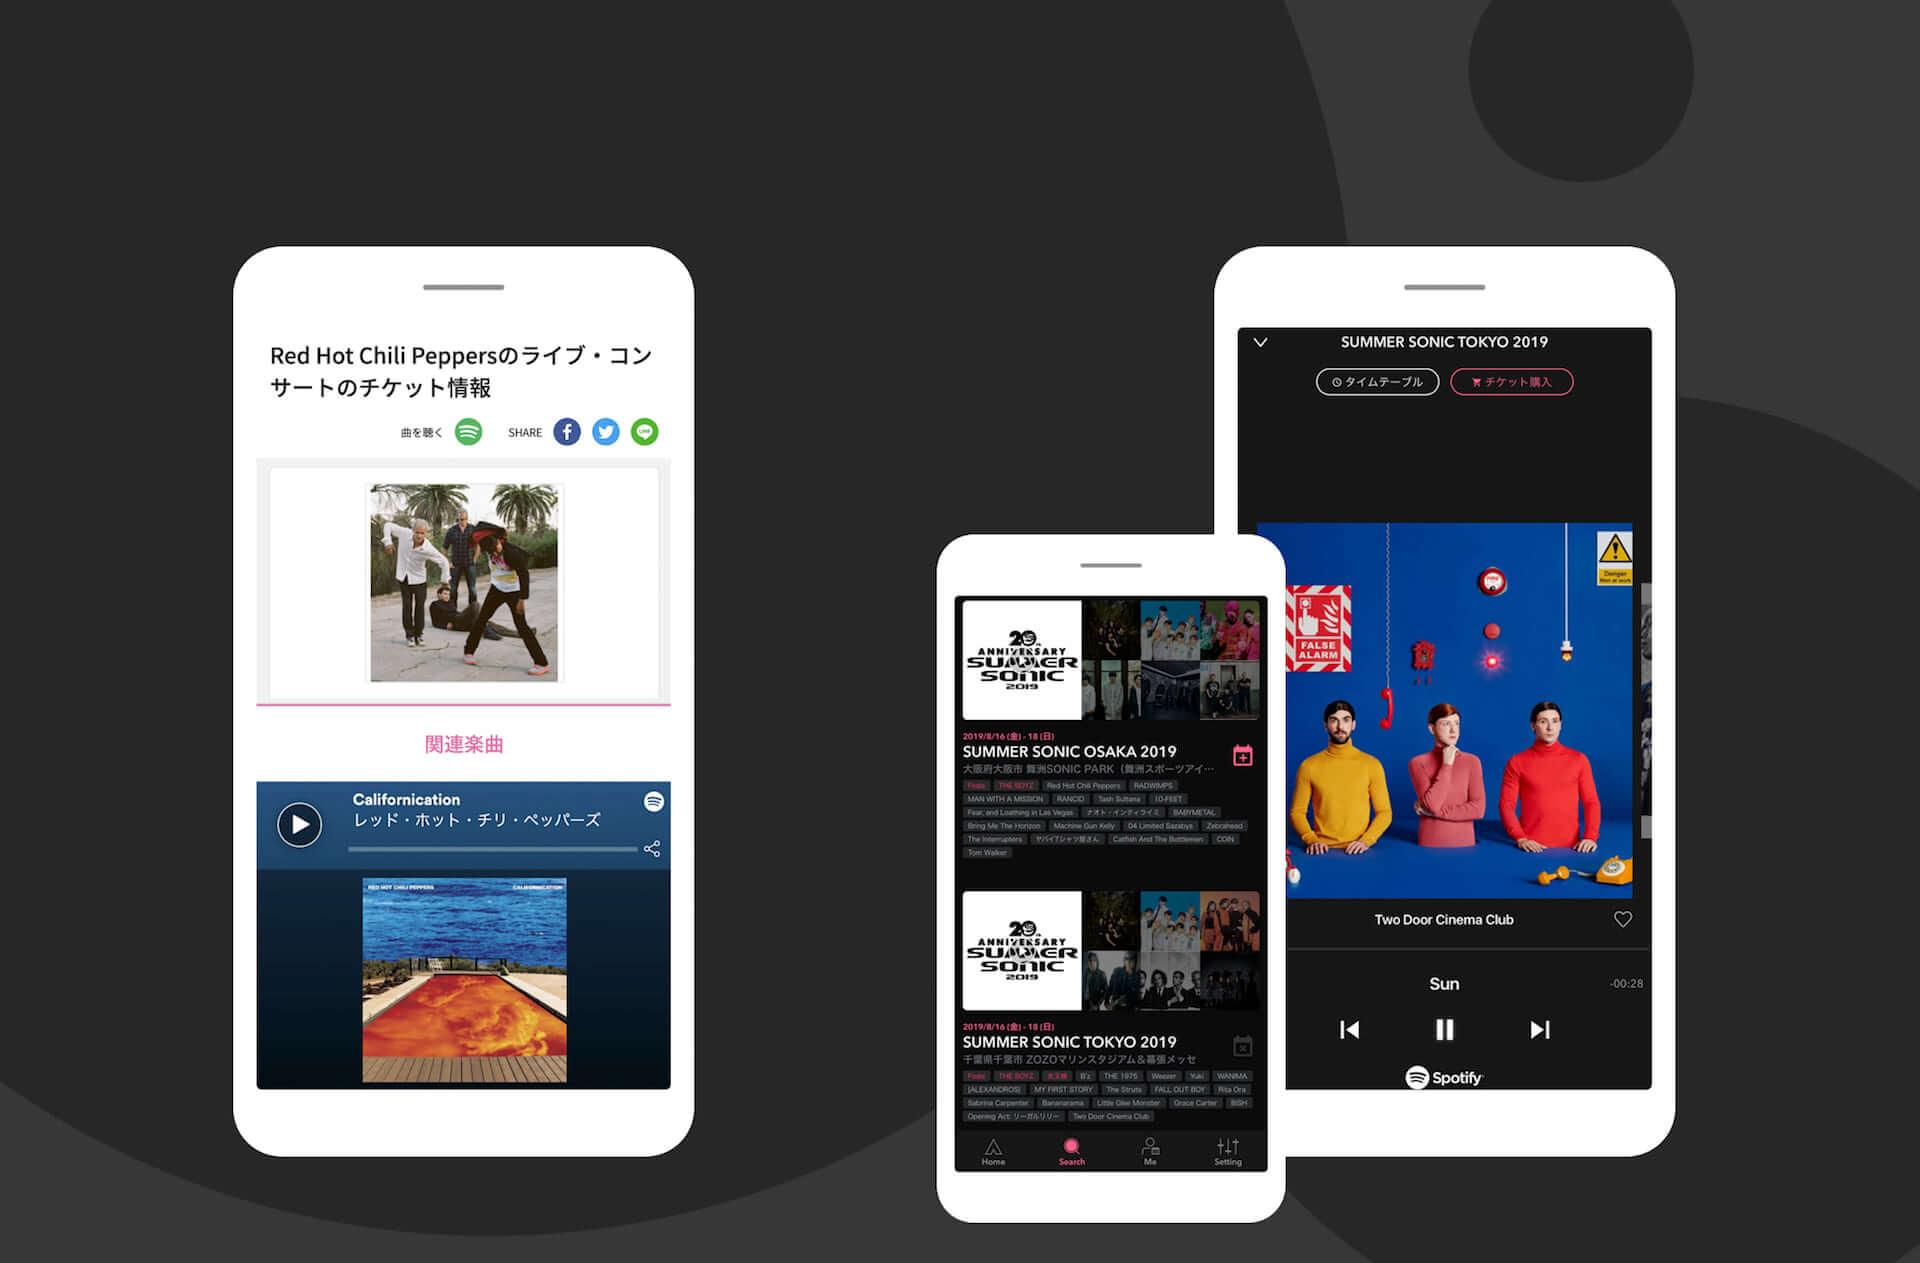 Spotifyから簡単にライブのチケットをゲット!イープラスとパートナーシップを締結 music190730_spotify_eplus_2-1920x1263